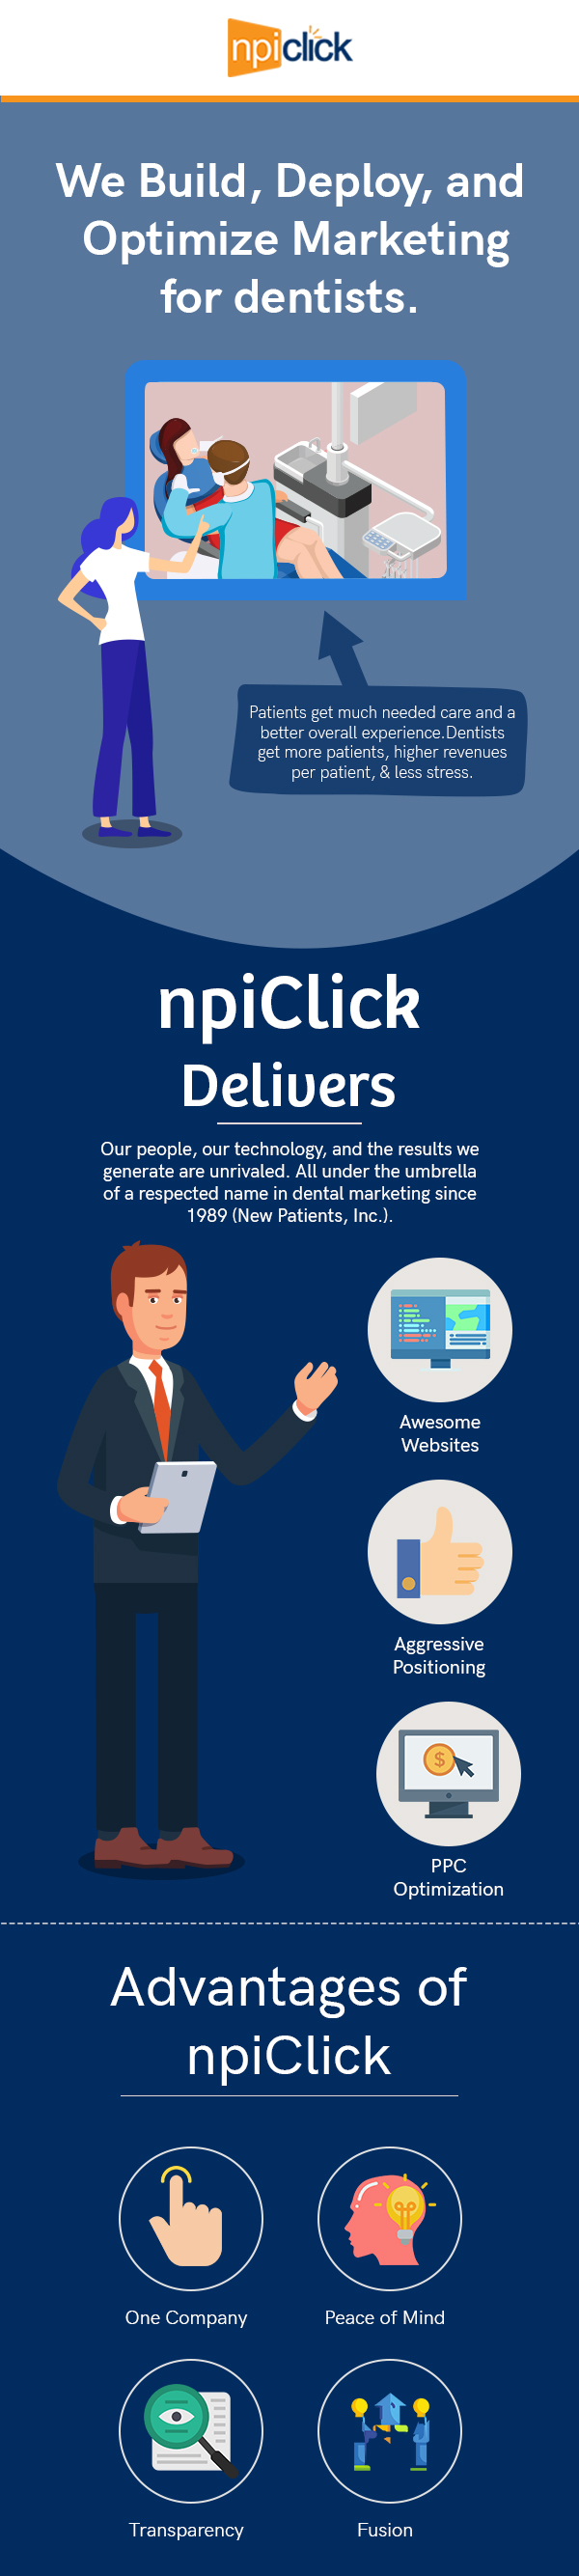 npiClick – A Trusted Marketing & SEO Company for Dentists